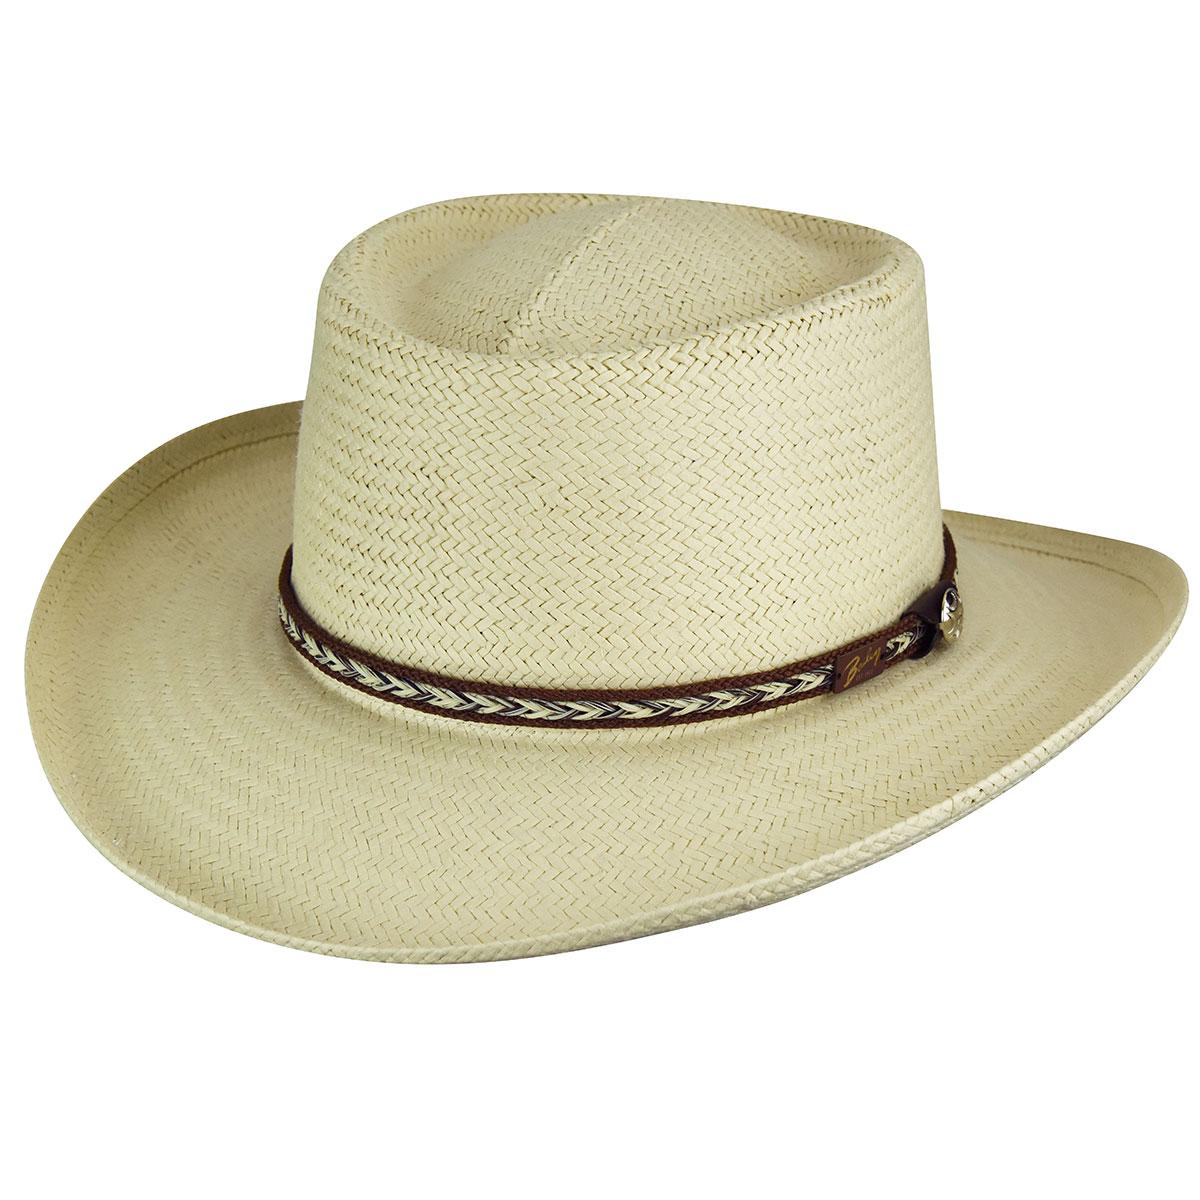 Steampunk Hats for Men | Top Hat, Bowler, Masks Rockett RainduraGambler - TanXL $110.00 AT vintagedancer.com